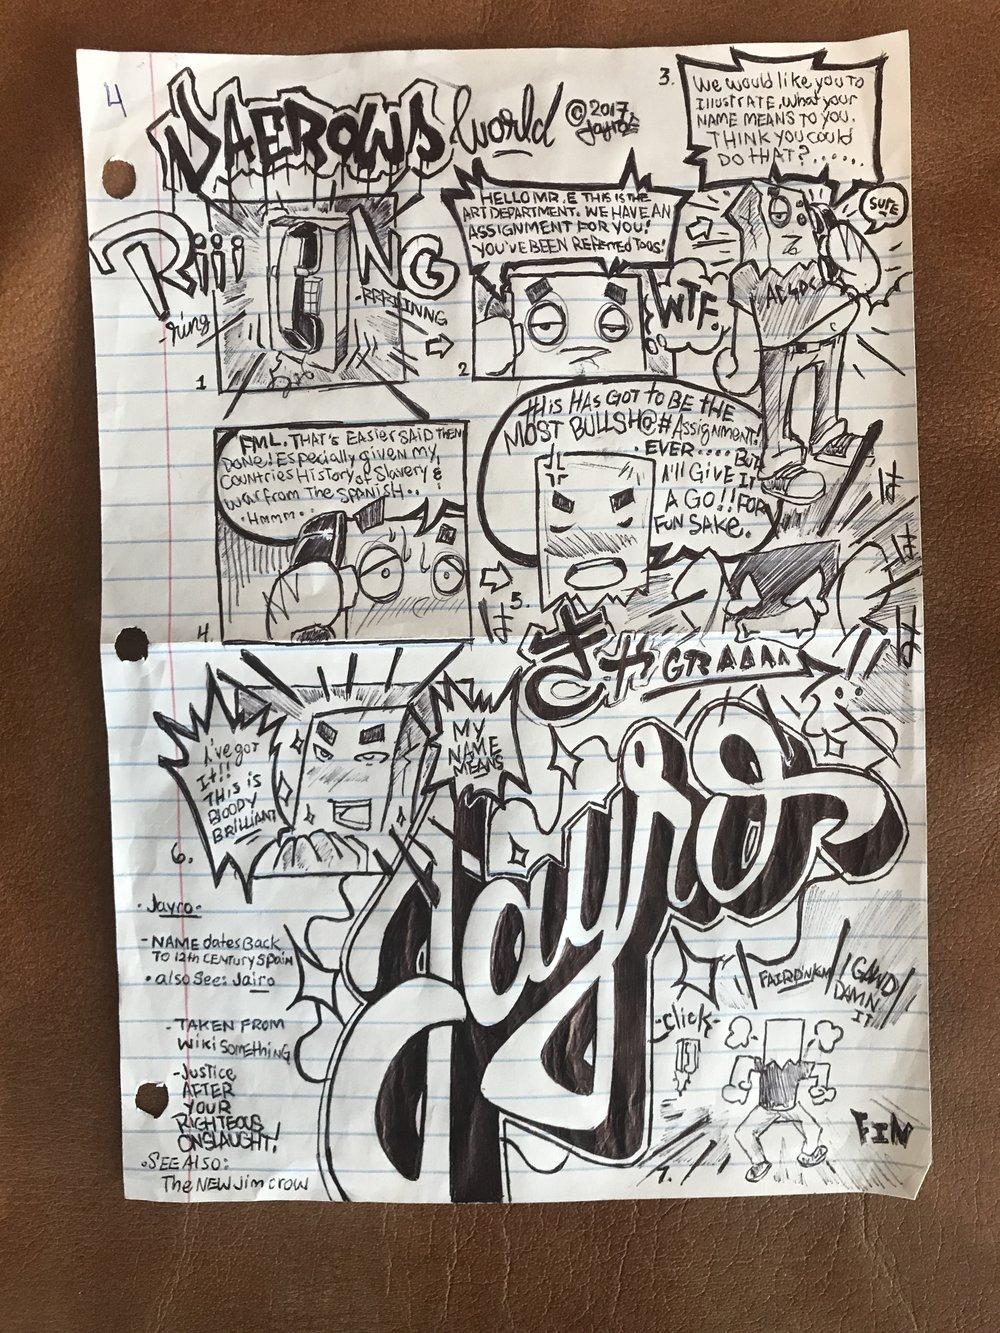 Jayro_comic.JPG